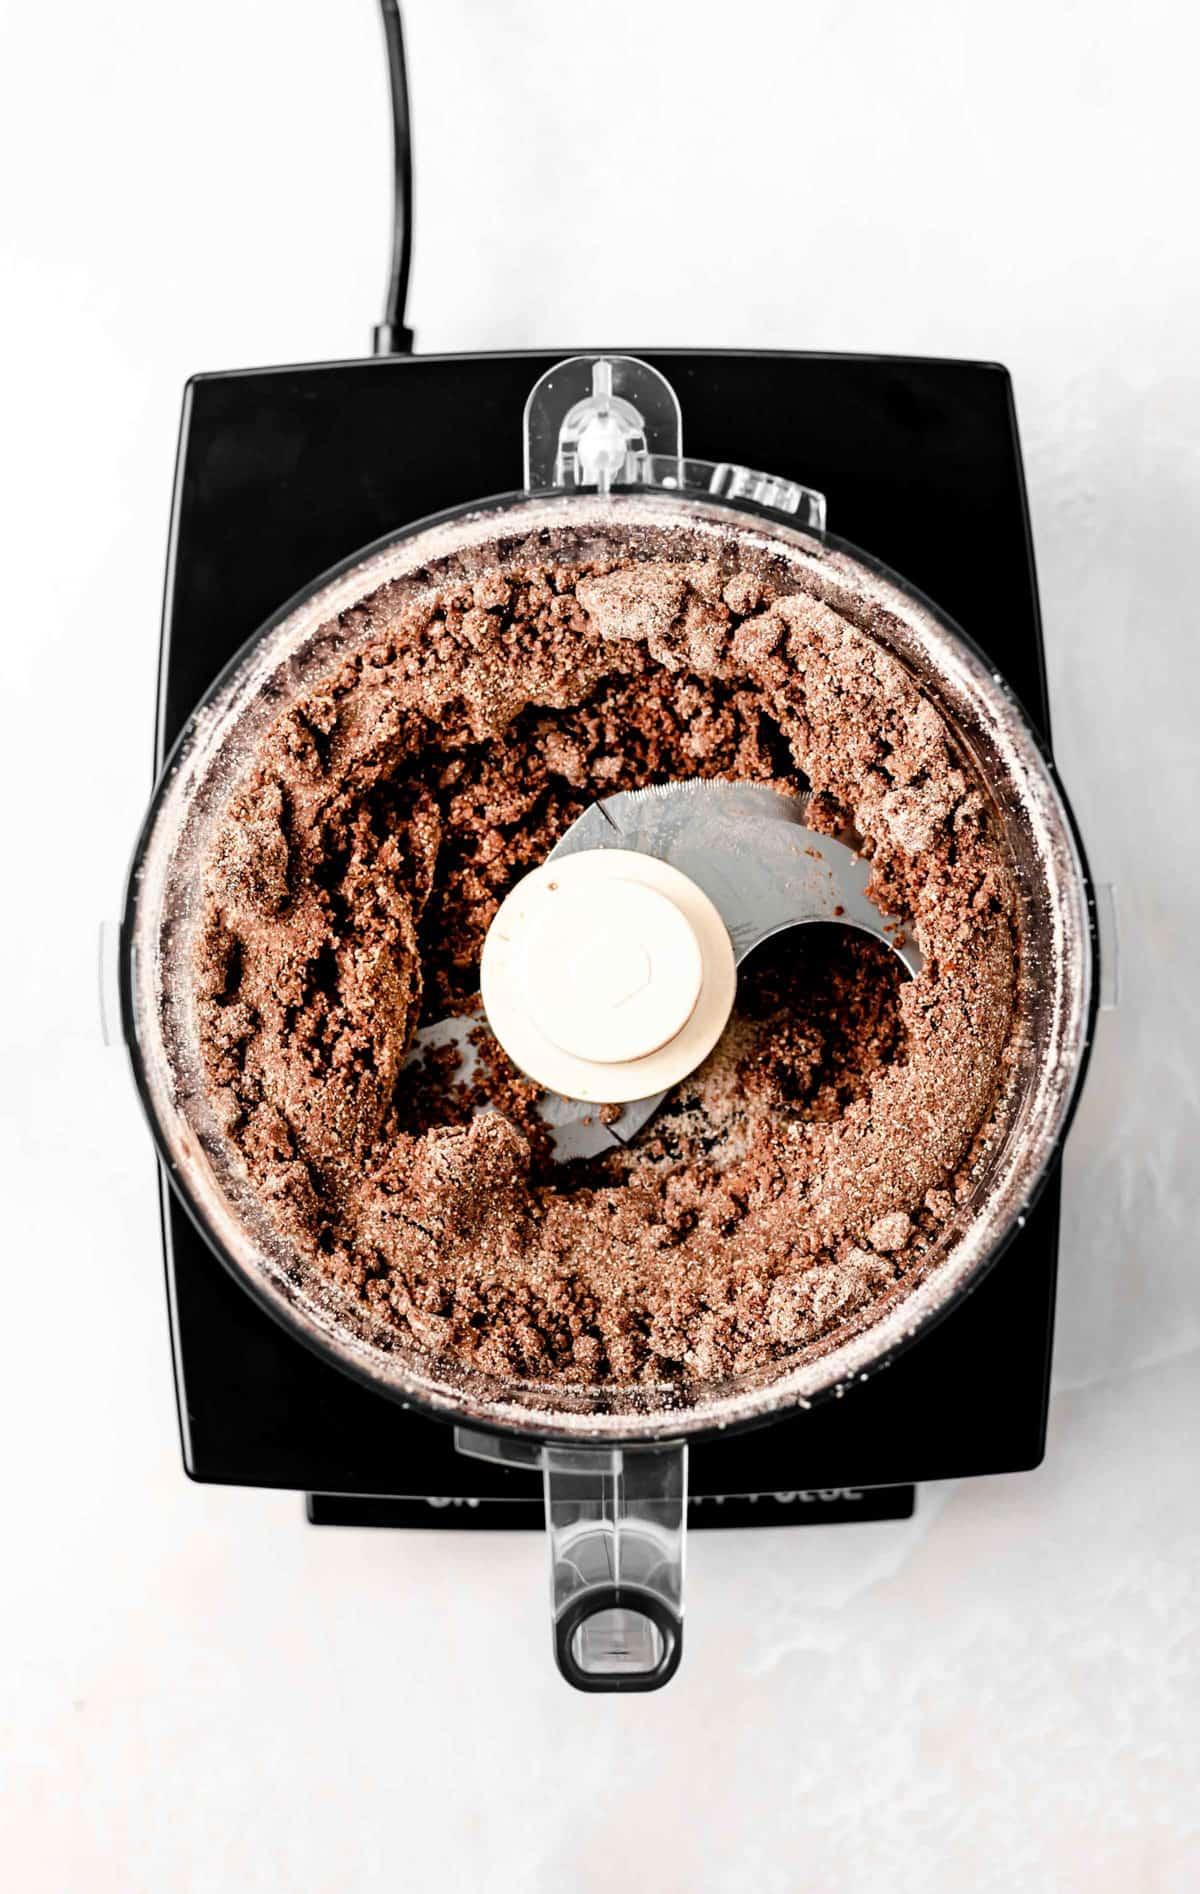 Tahini bar crust in food processor